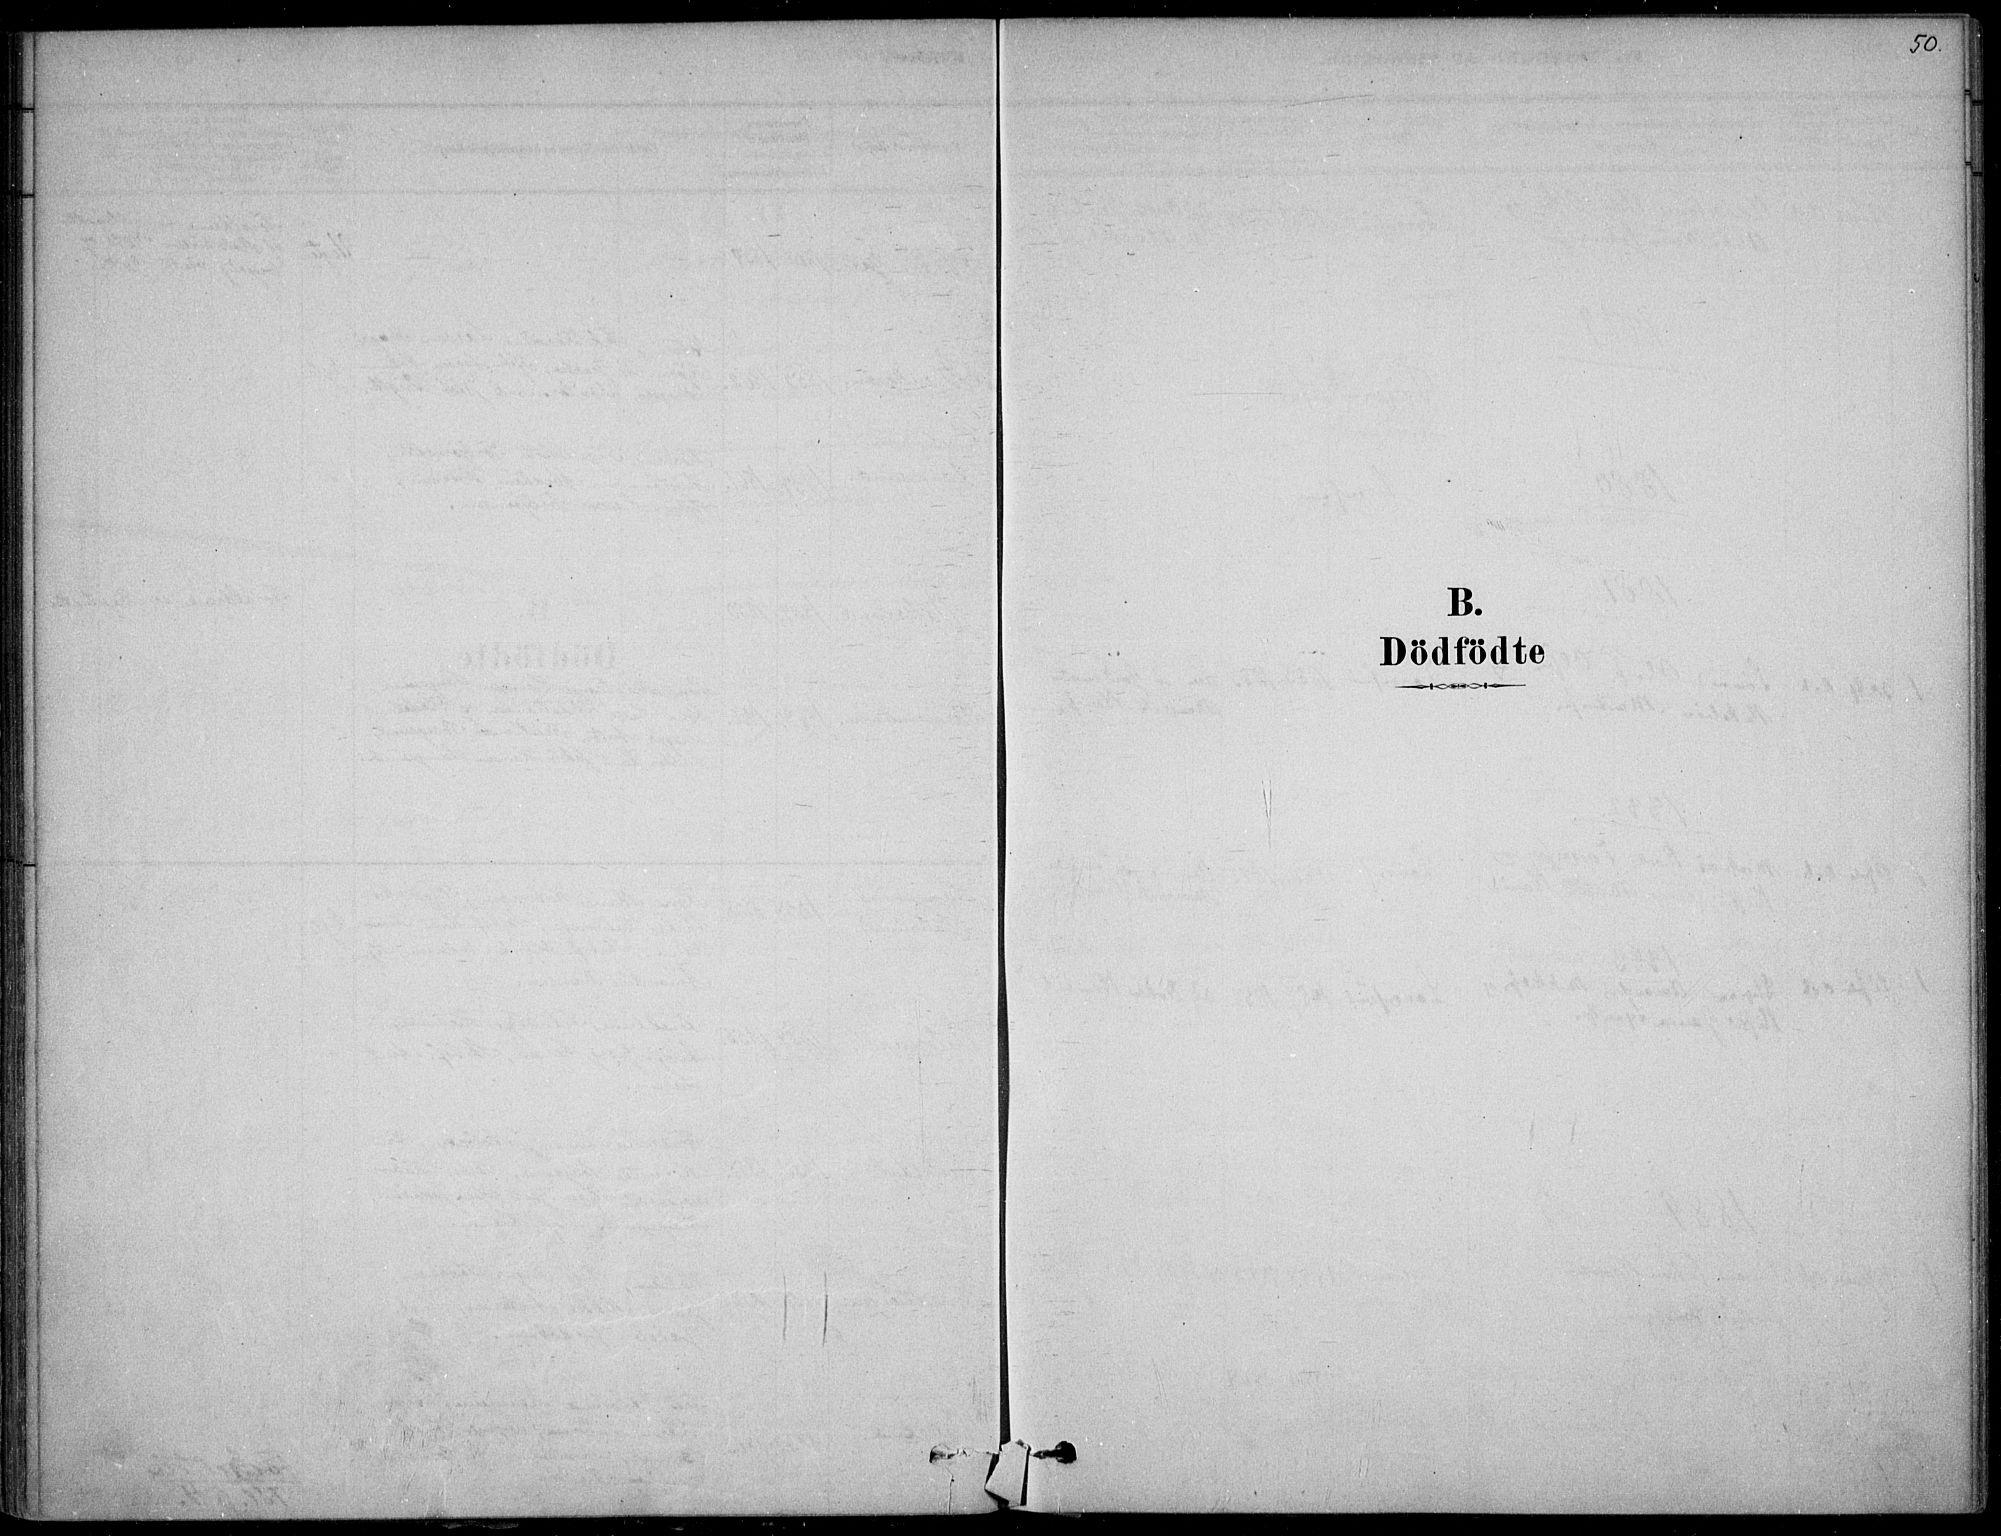 SAKO, Langesund kirkebøker, F/Fa/L0002: Ministerialbok nr. 2, 1878-1892, s. 50